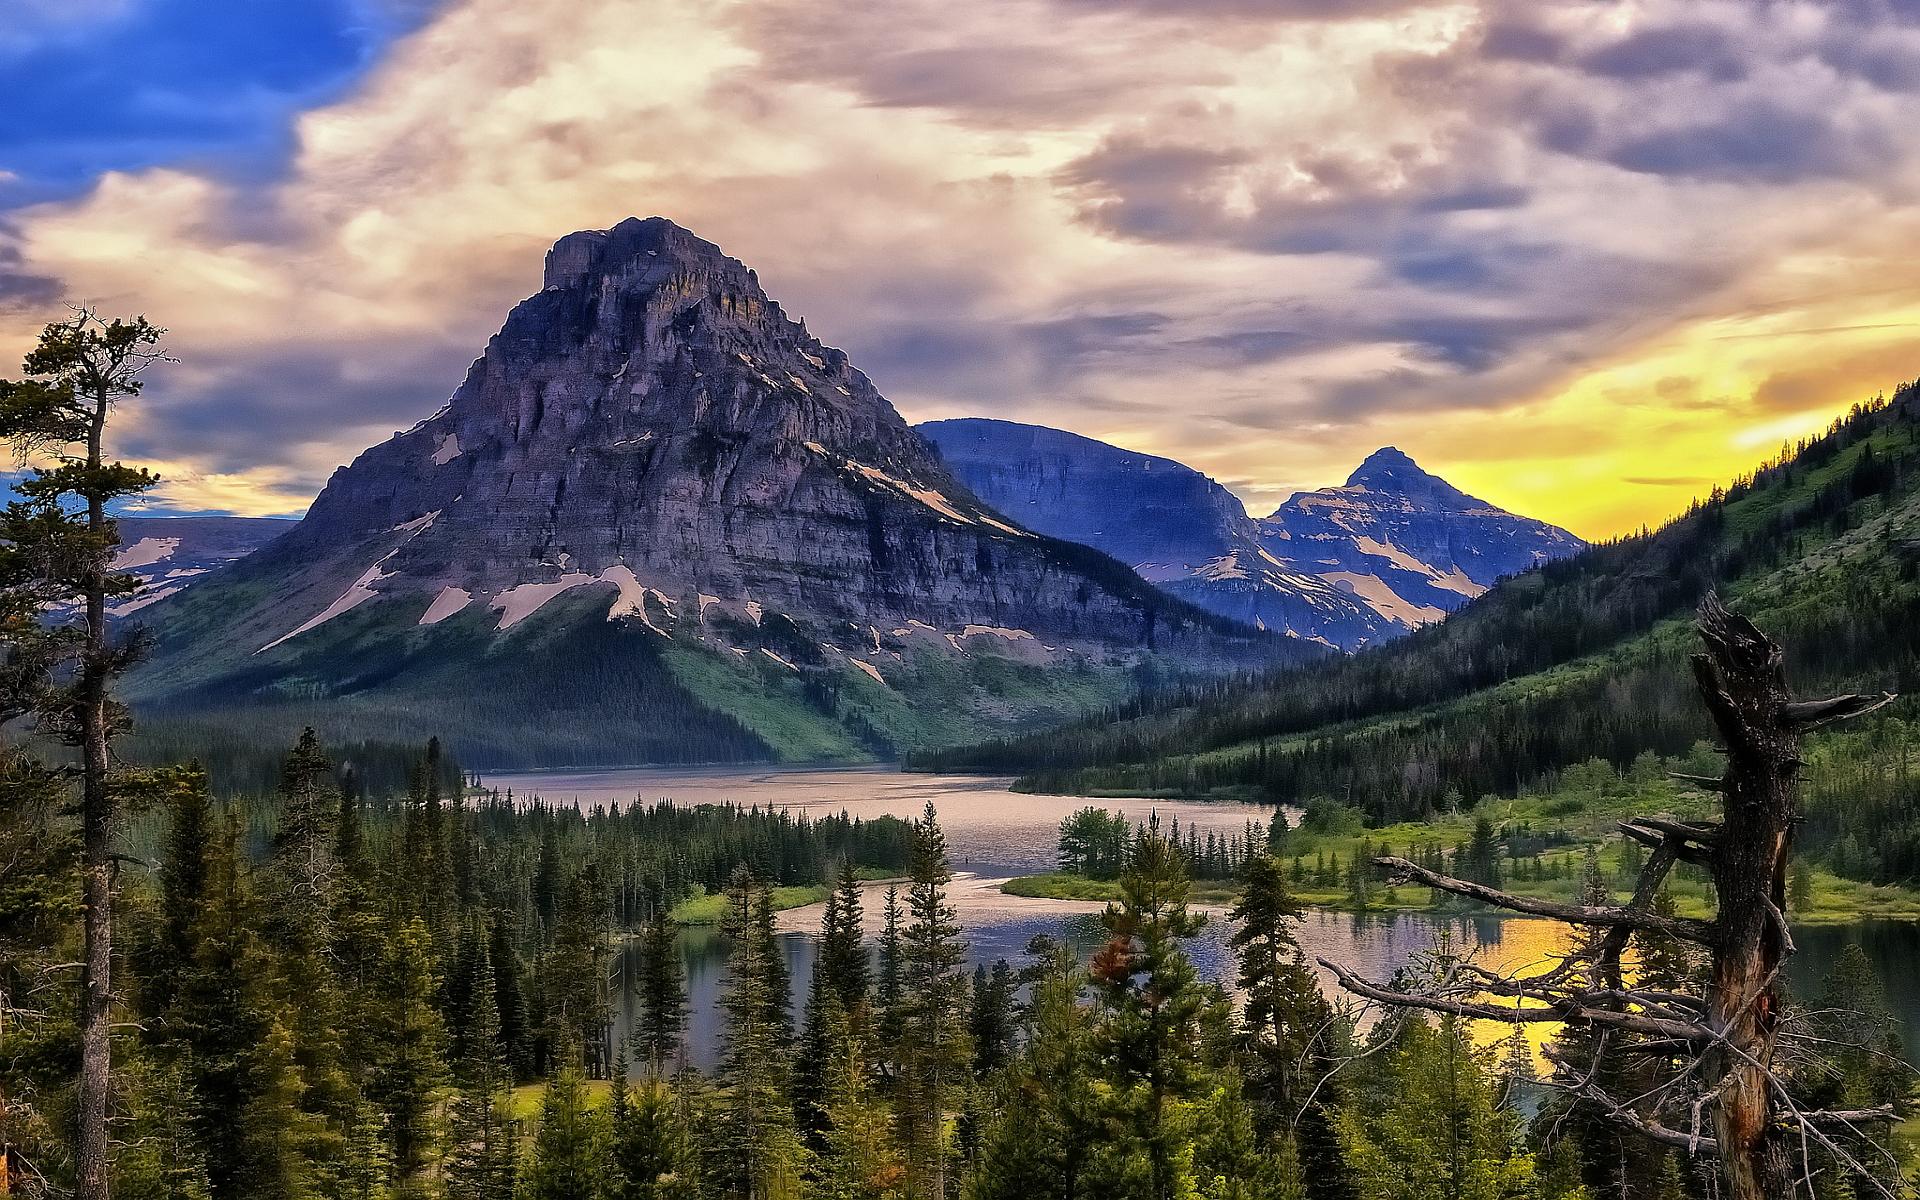 Free Live Fall Wallpapers For Desktop Lake Glacier Park Hd Desktop Wallpapers 4k Hd